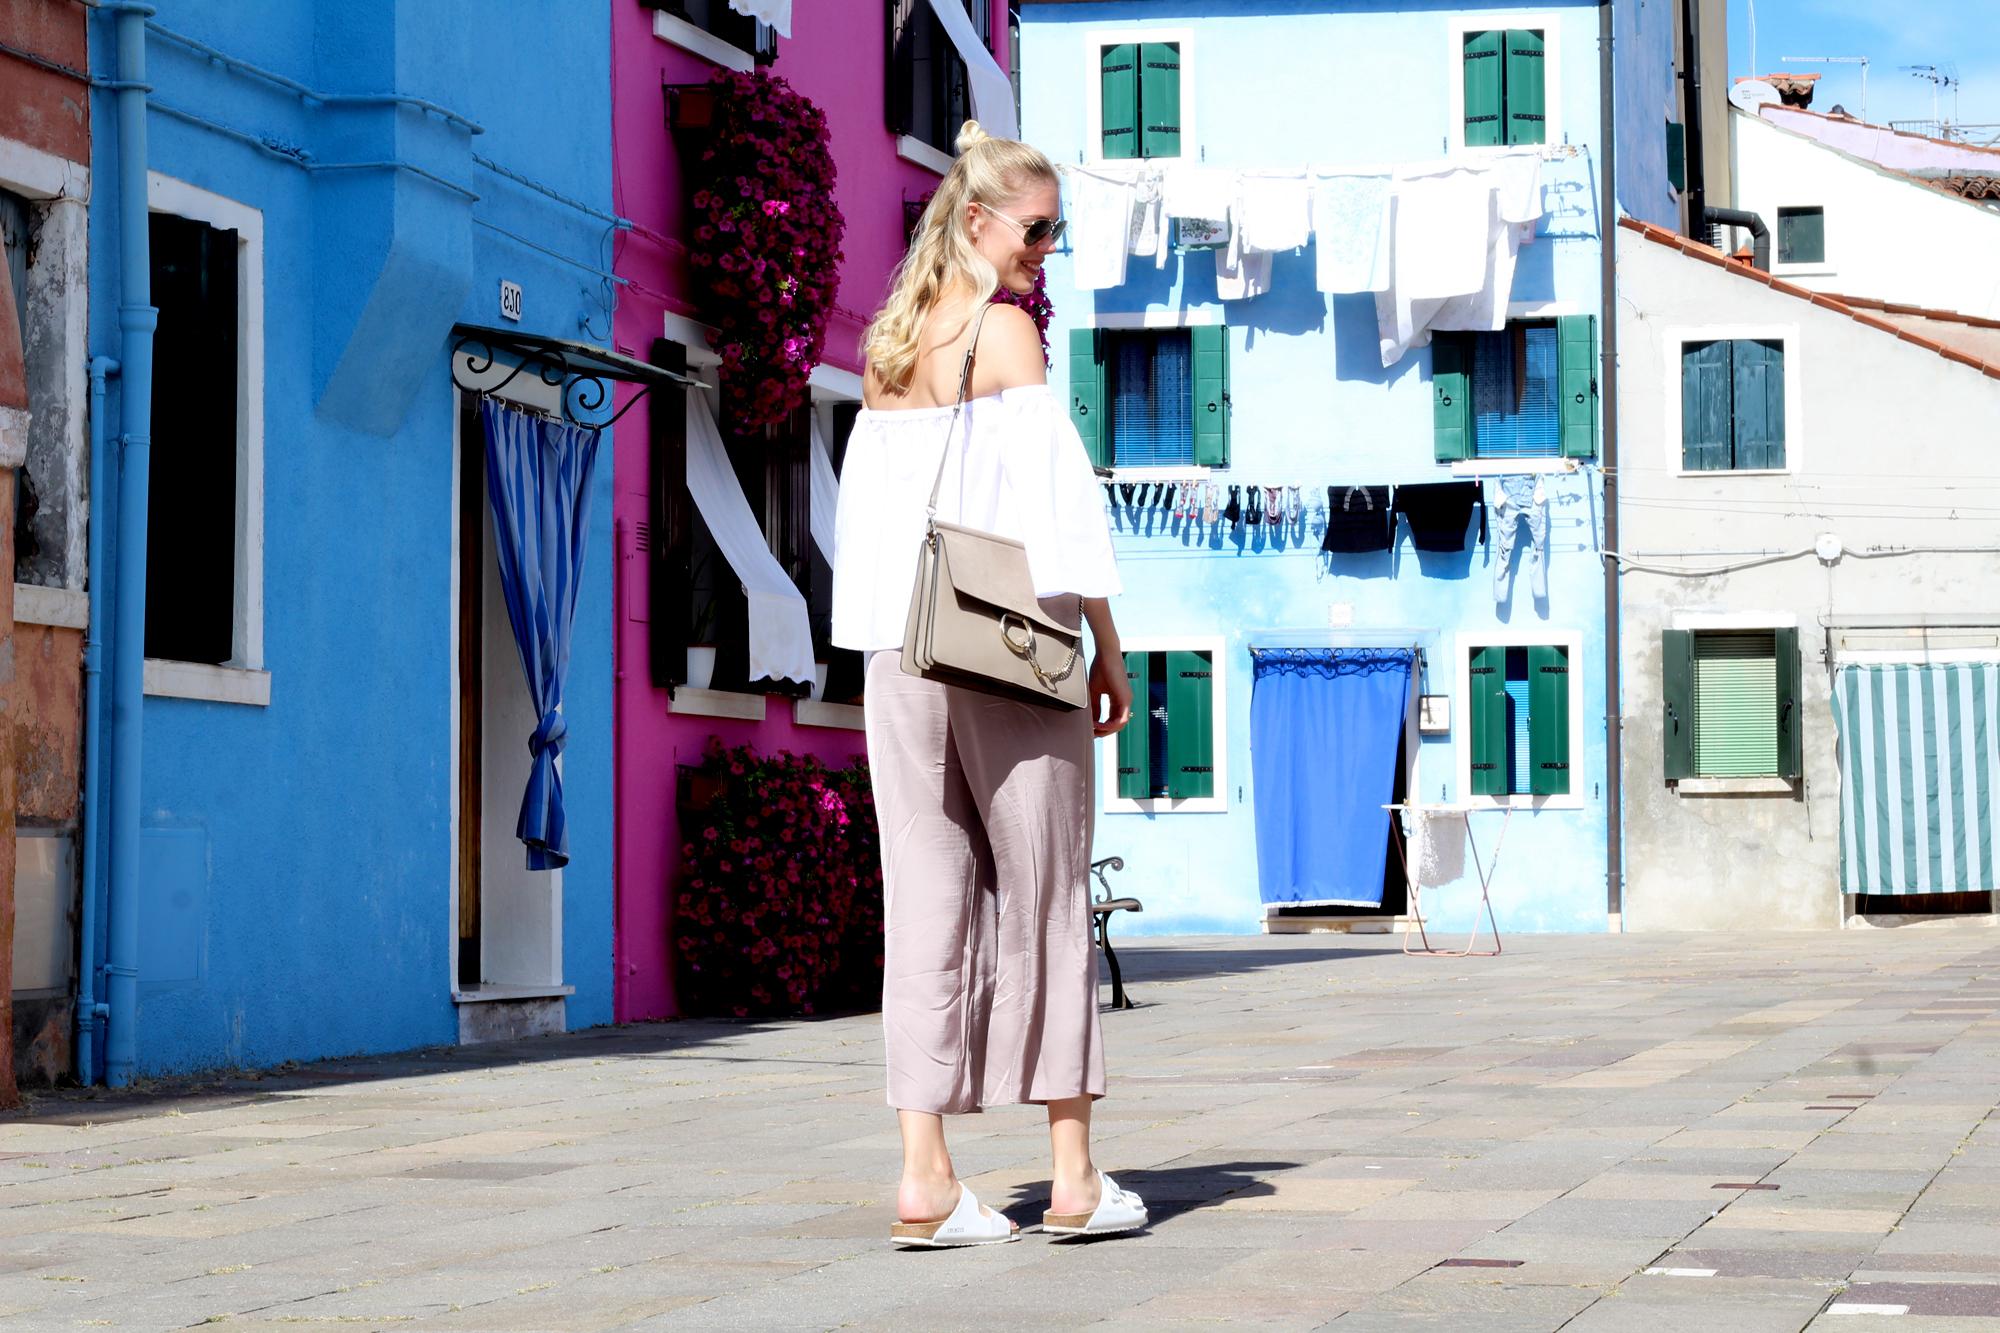 burano_italy_somehappyshoes_verena_julia_fashionblog